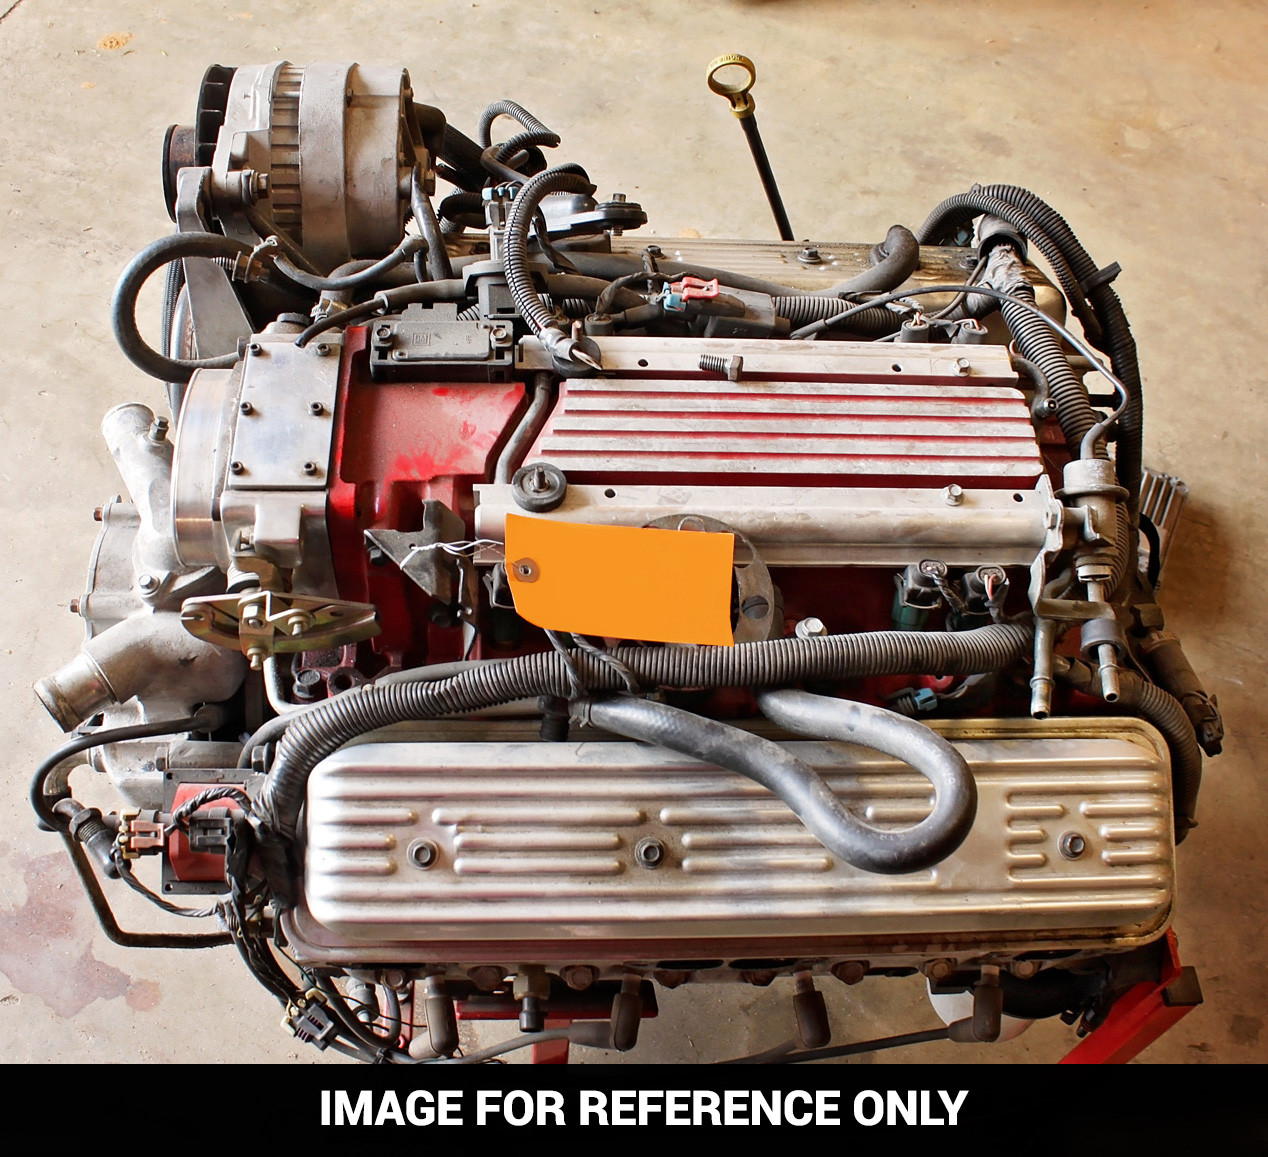 1997 Camaro Lt1 Wiring Harness 100% Free Wiring Diagram \u2022 Lt1 Fuel  Pump Wiring Upgrade 96 Lt1 Wiring Harness Location